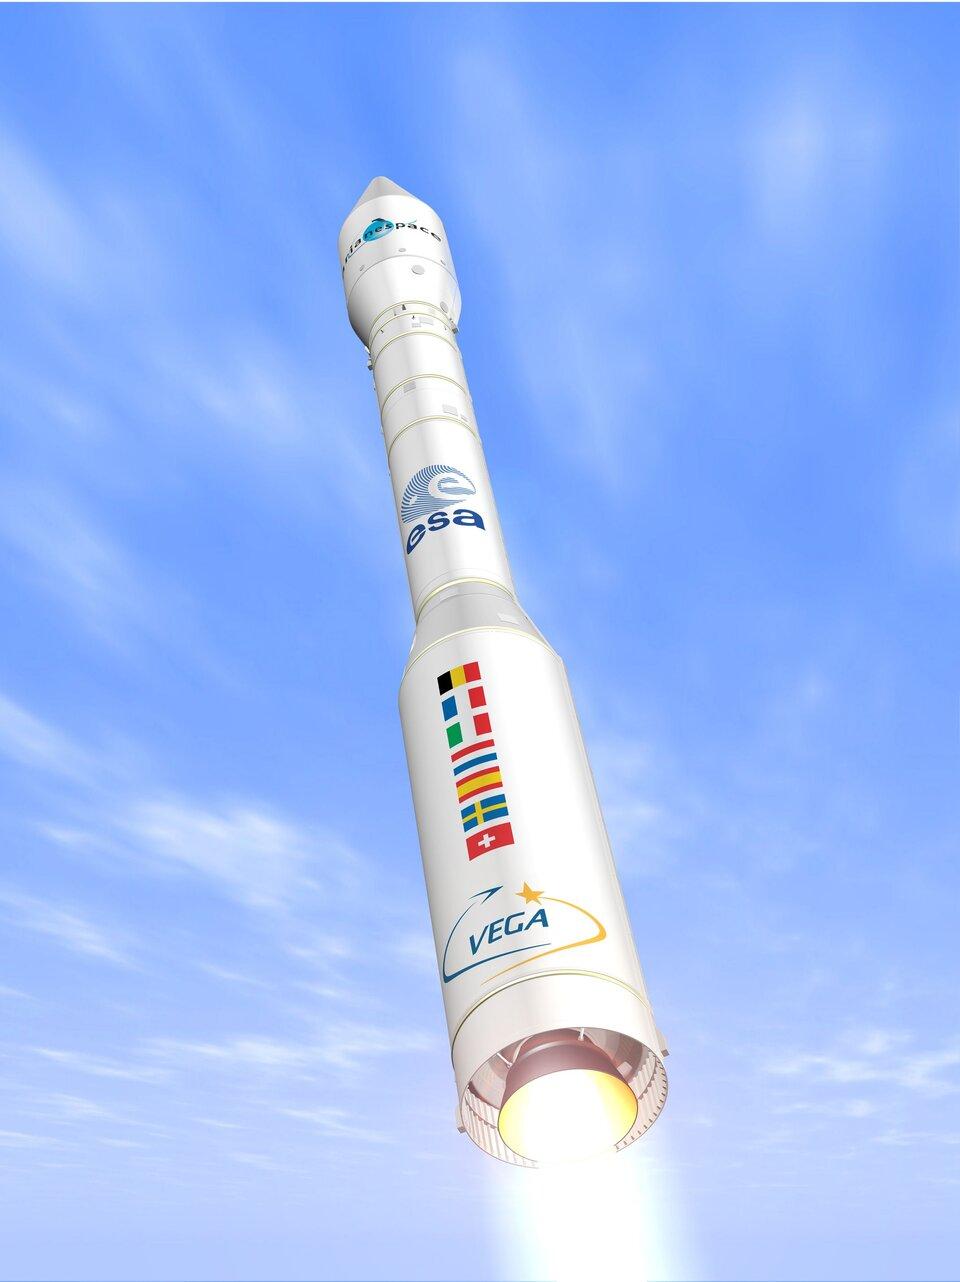 Agenda 2025 ESA Concept artistico del lanciatore Vega Credit: ESA